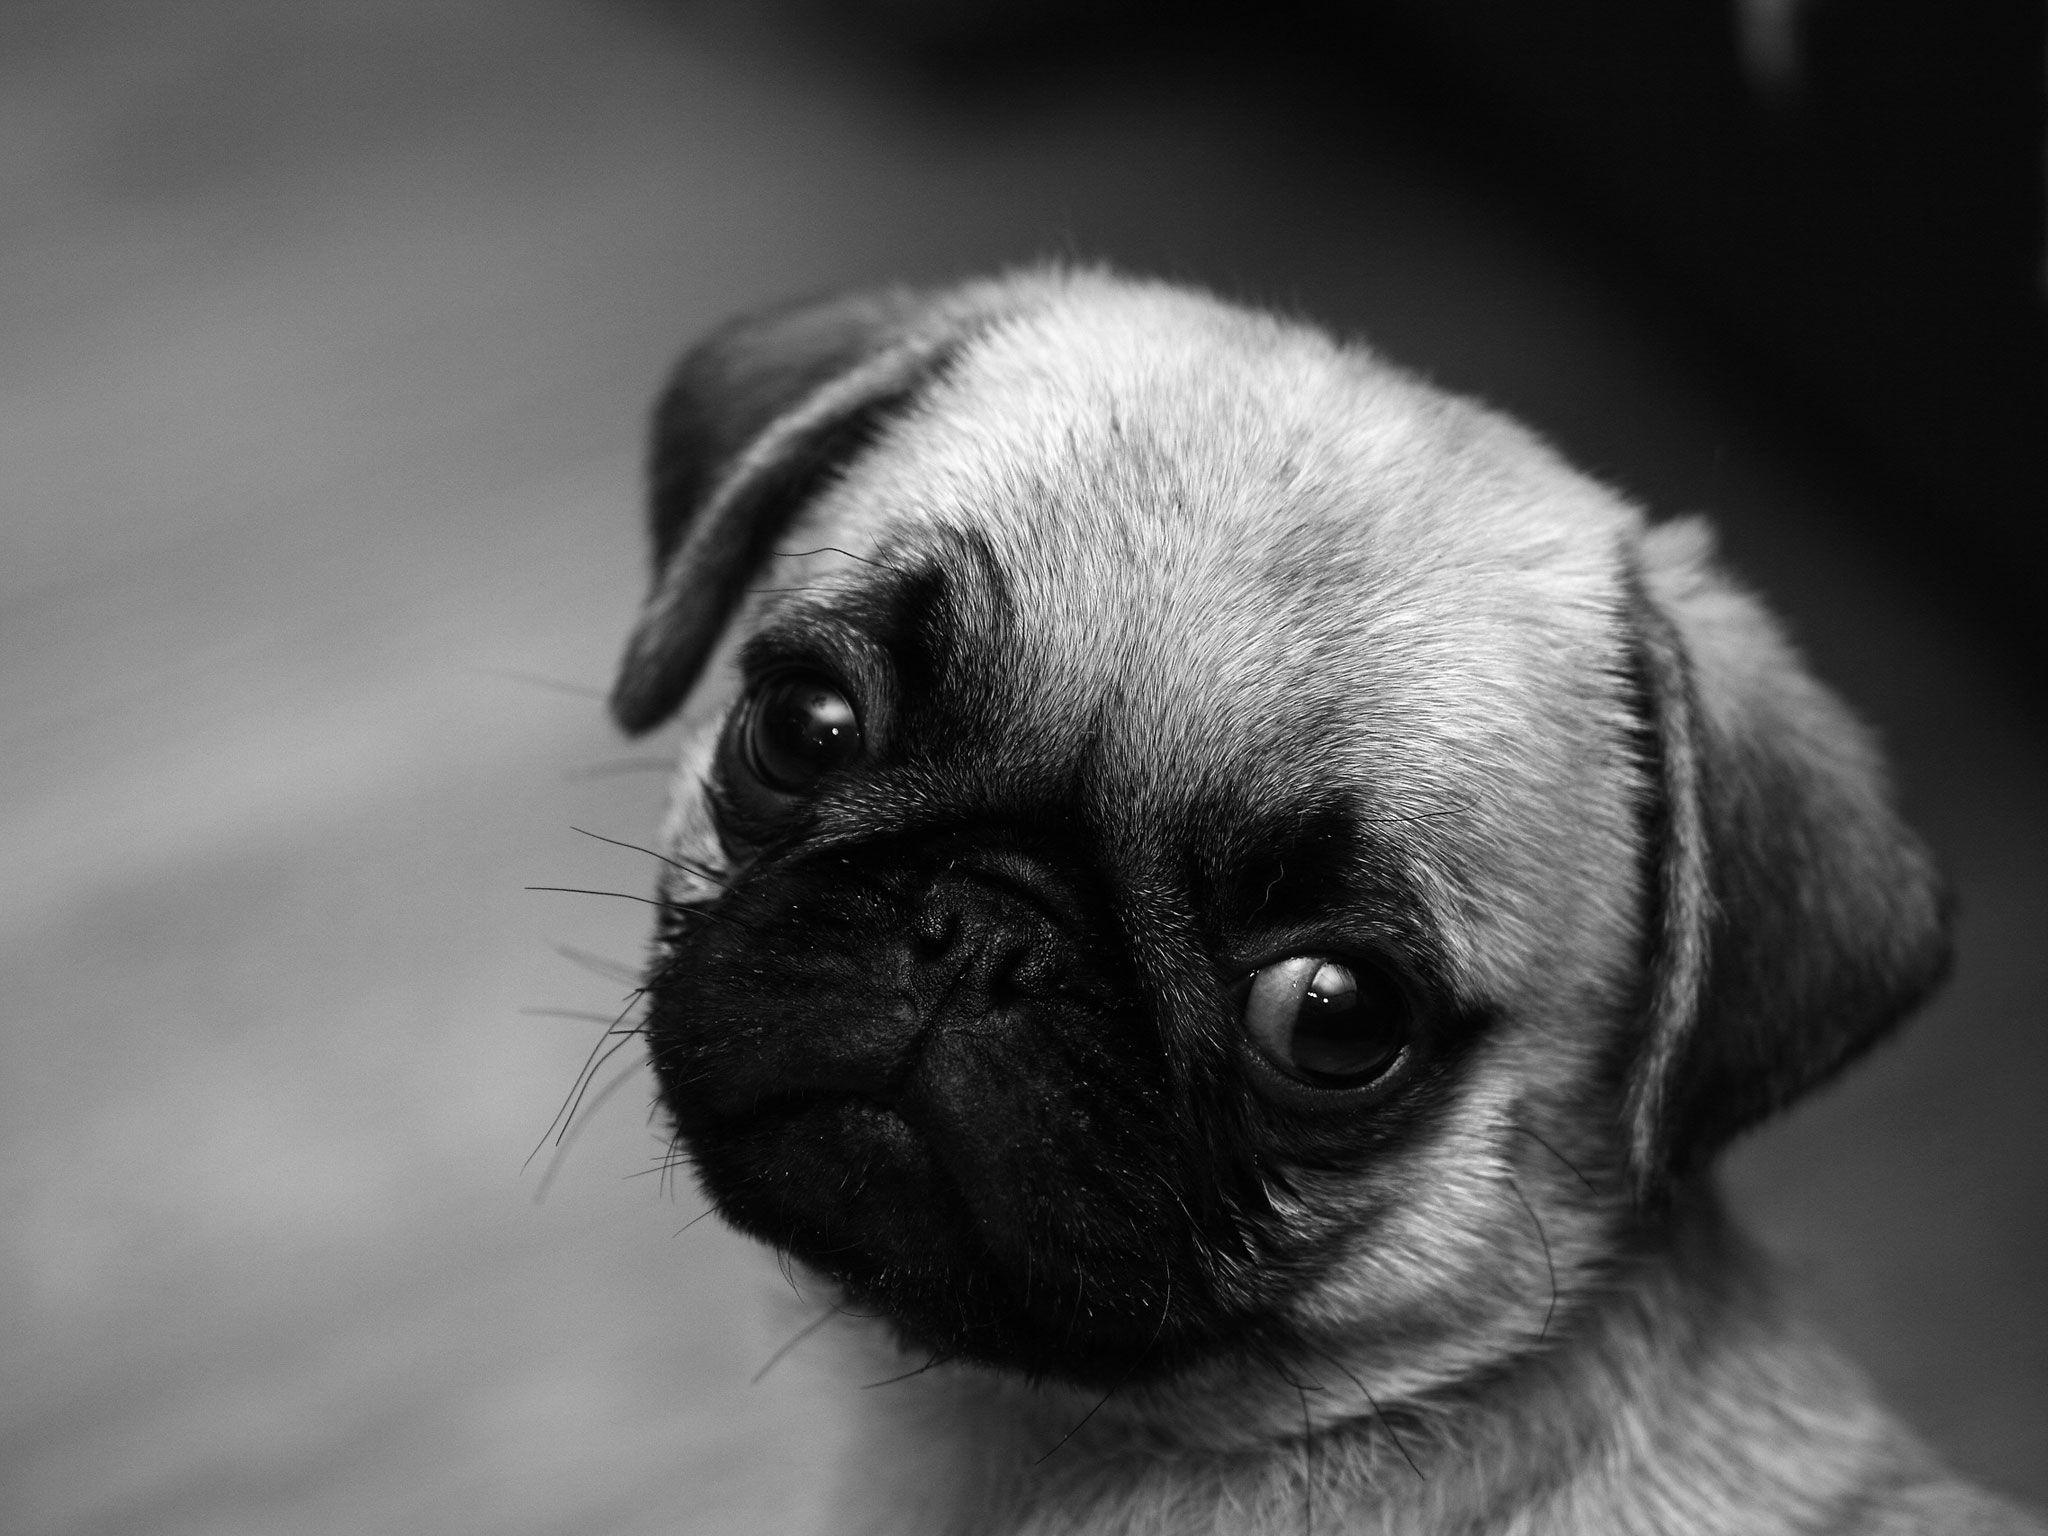 Pug Puppies Wallpaper Desktop Pugs Pinterest Pug Puppies And